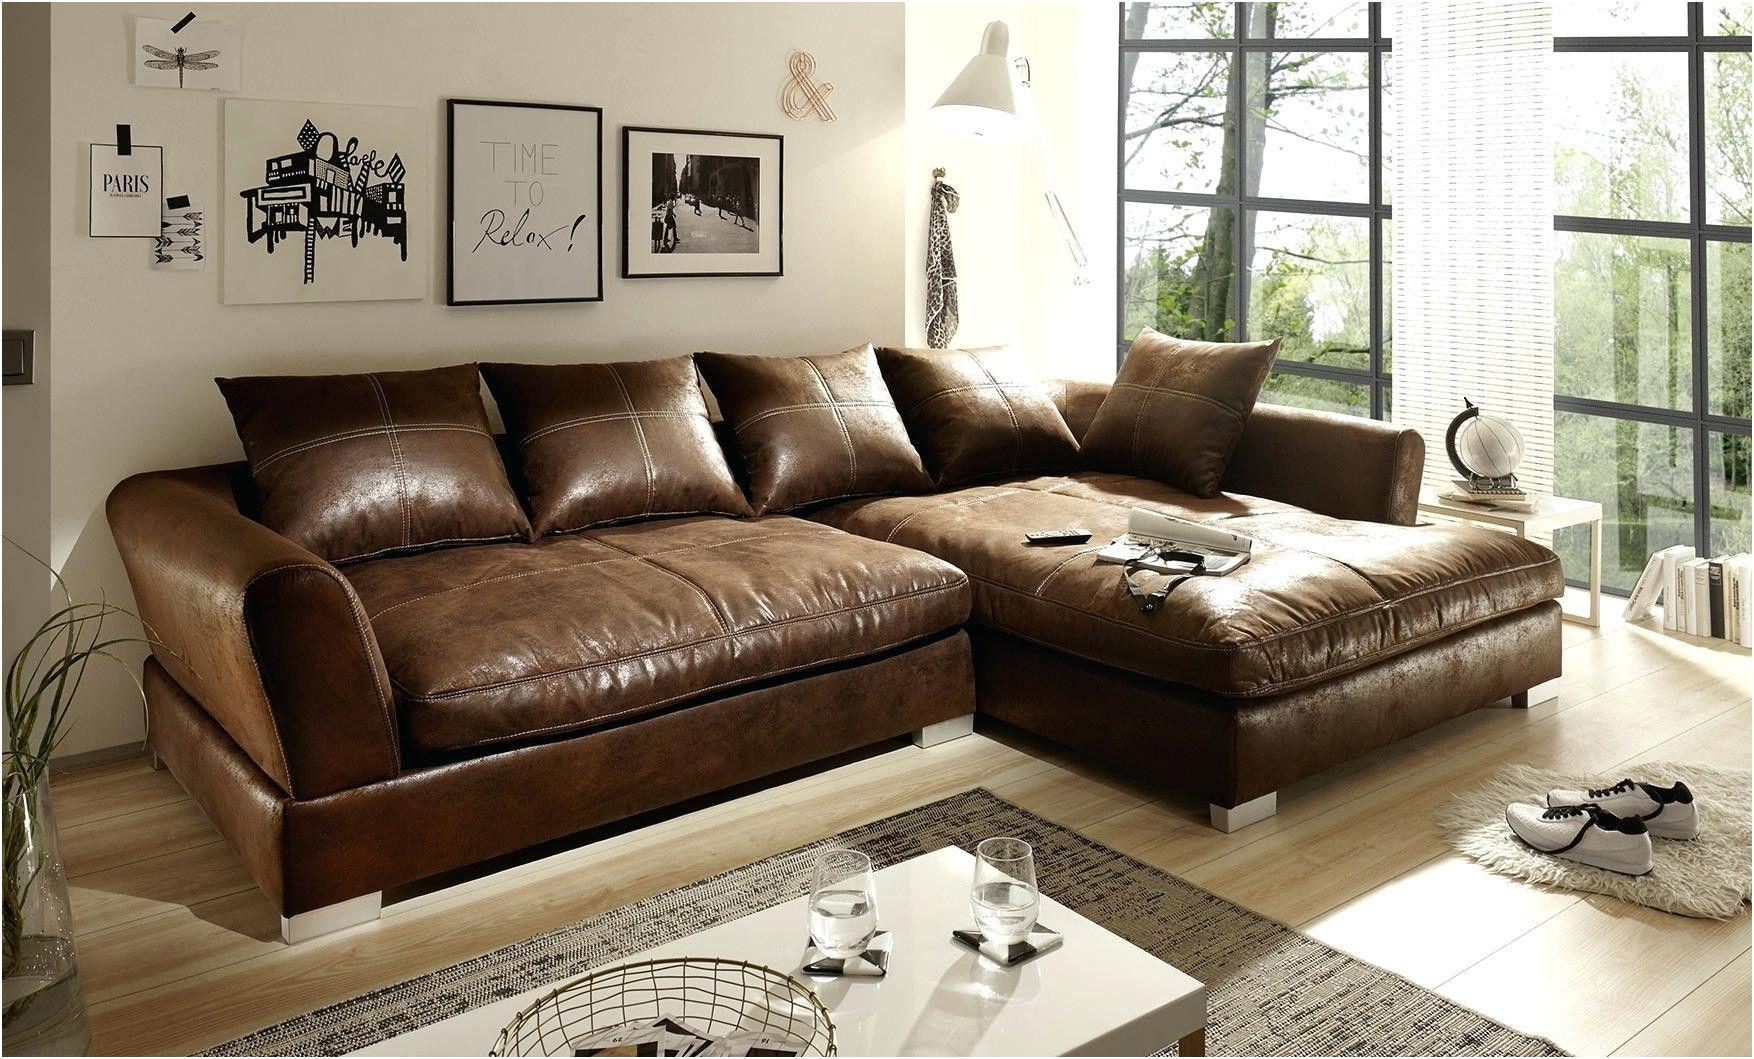 Kreativ Big Sofa Echtleder Oversized Sectional Sofa Vintage Sofa Big Sofas